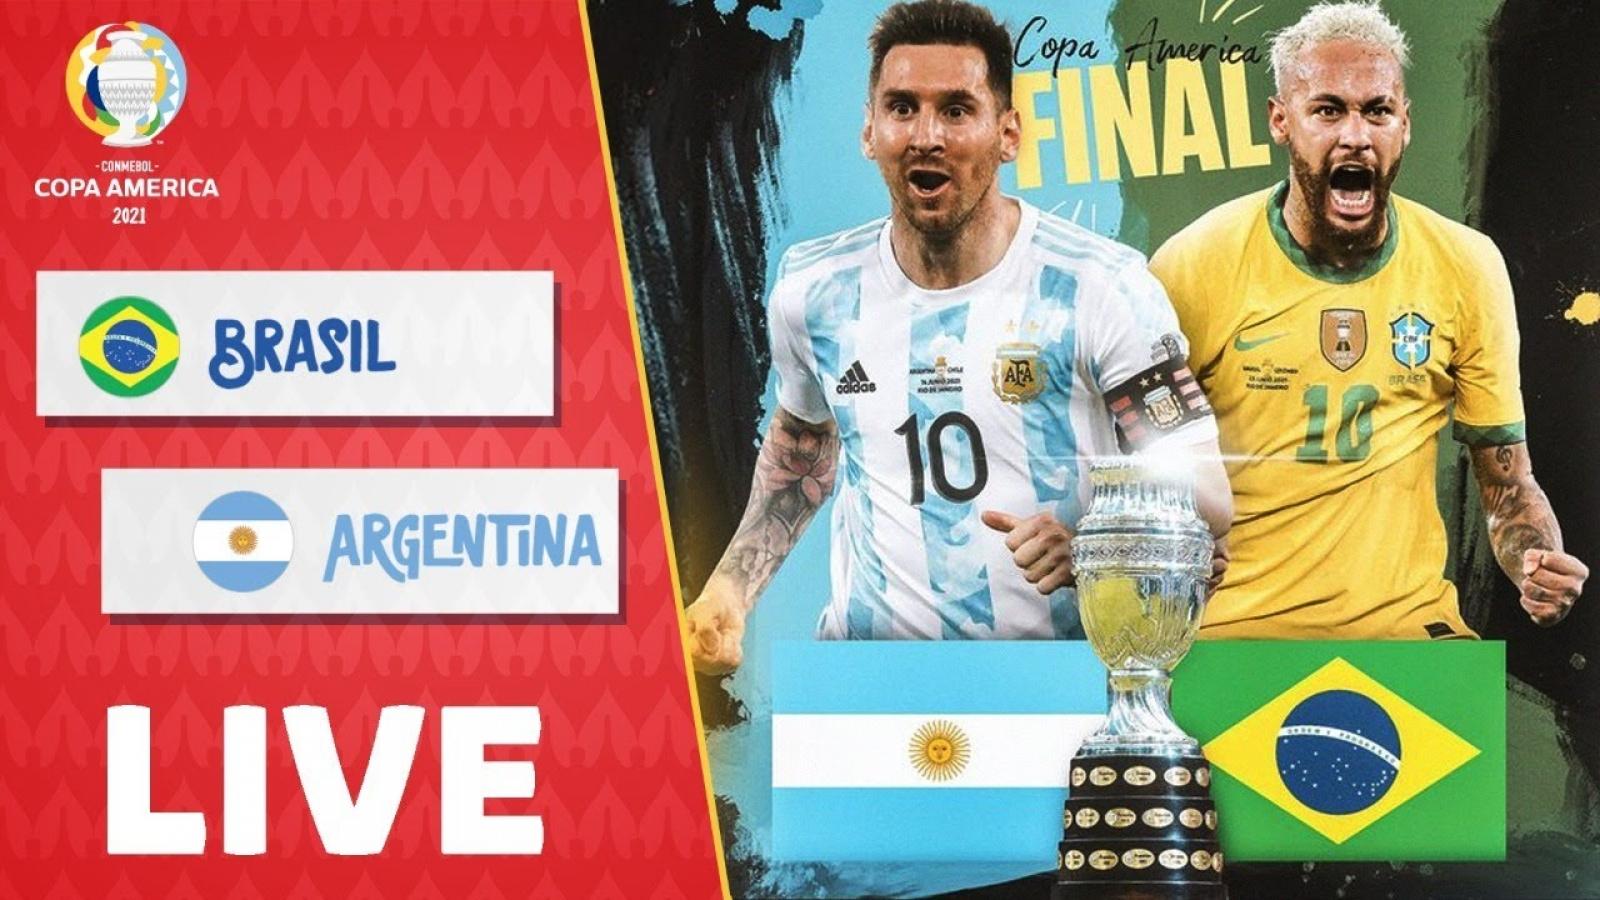 Xem trực tiếp Brazil vs Argentina chung kết Copa America 2021